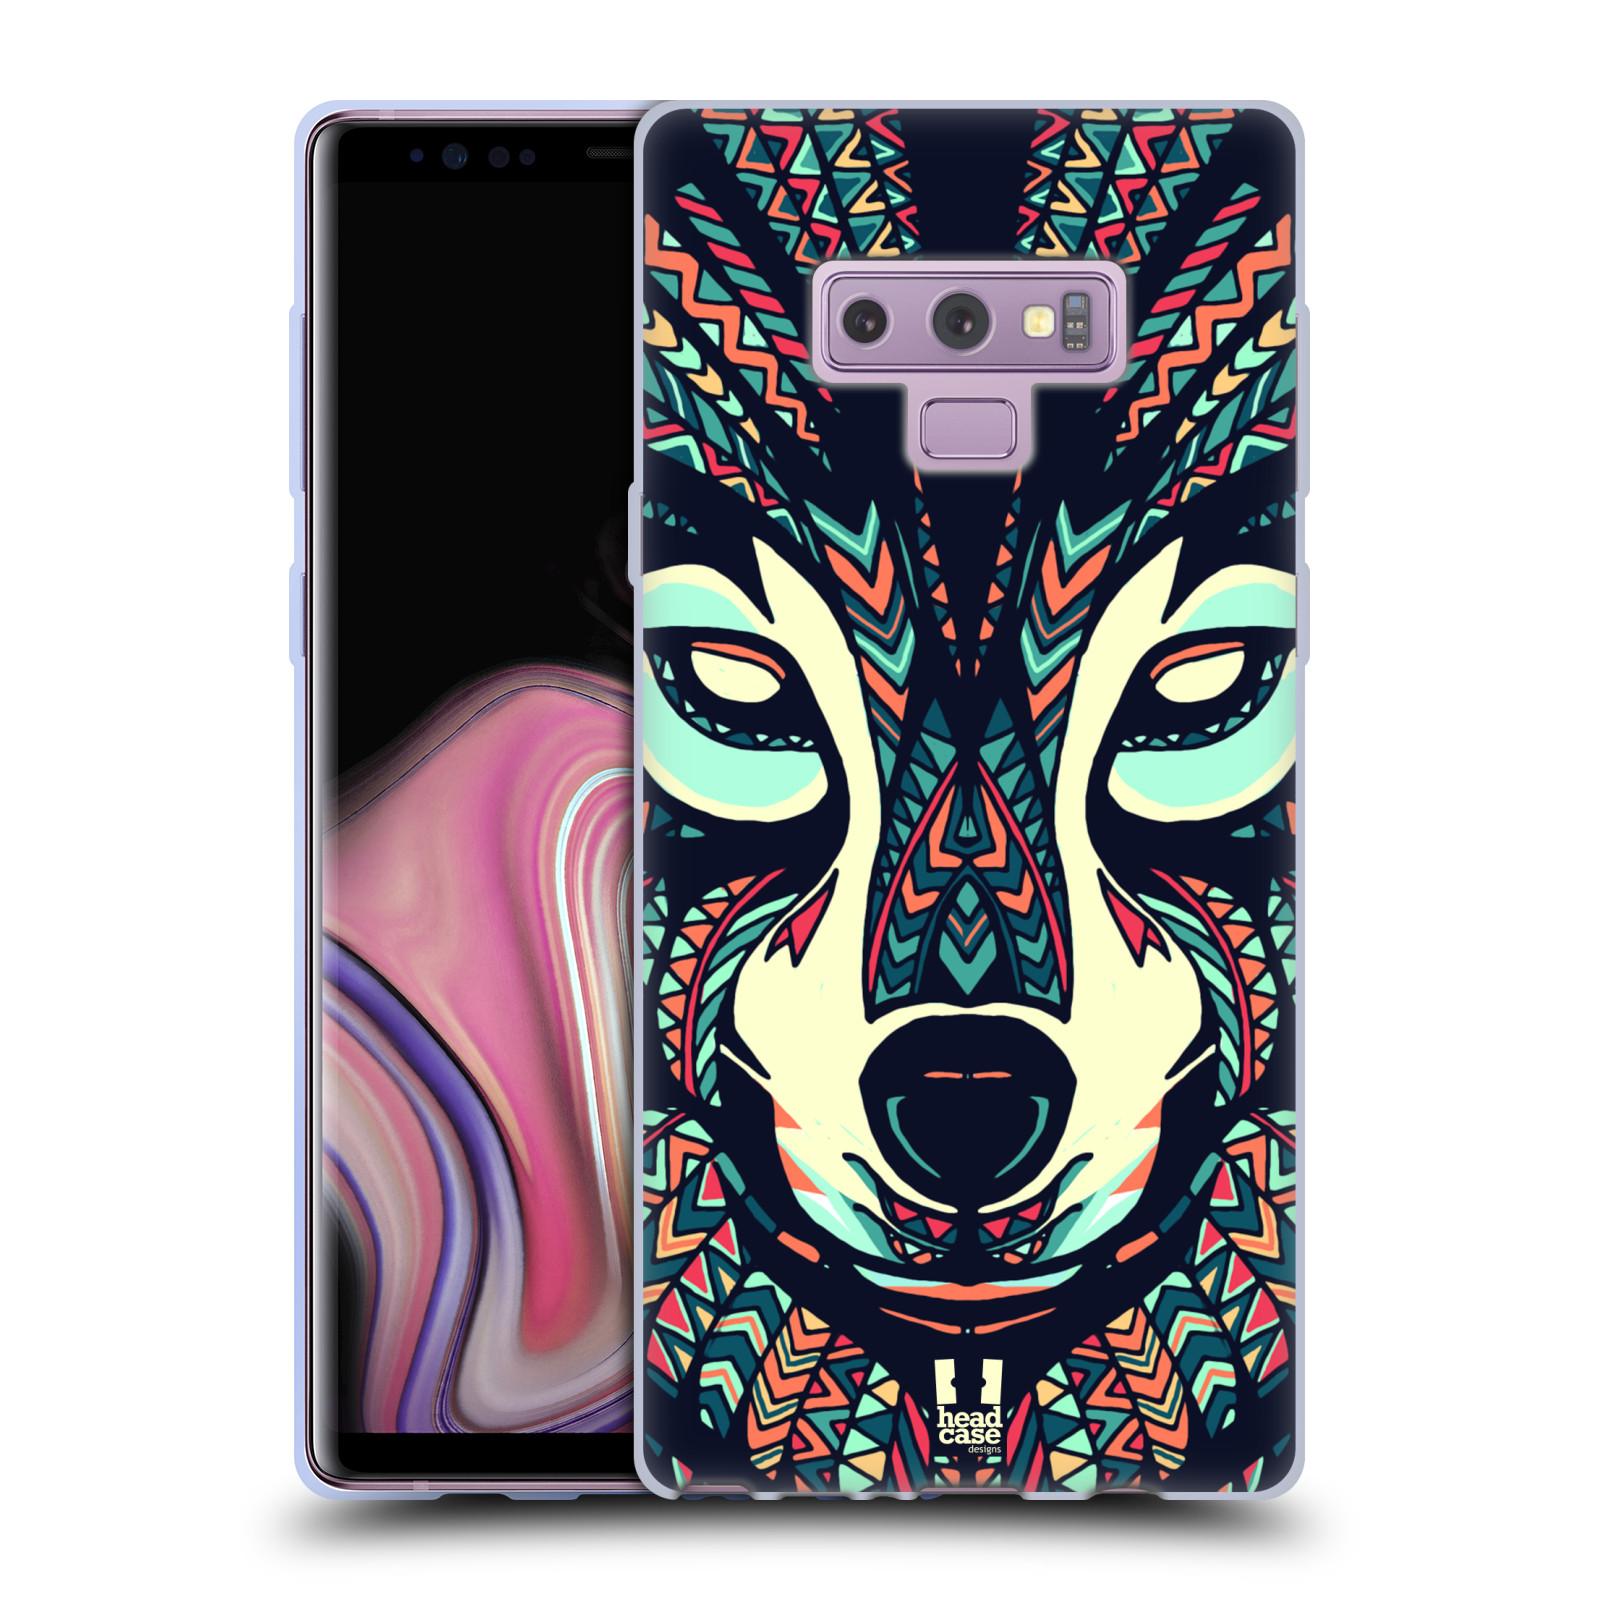 Silikonové pouzdro na mobil Samsung Galaxy Note 9 - Head Case - AZTEC VLK